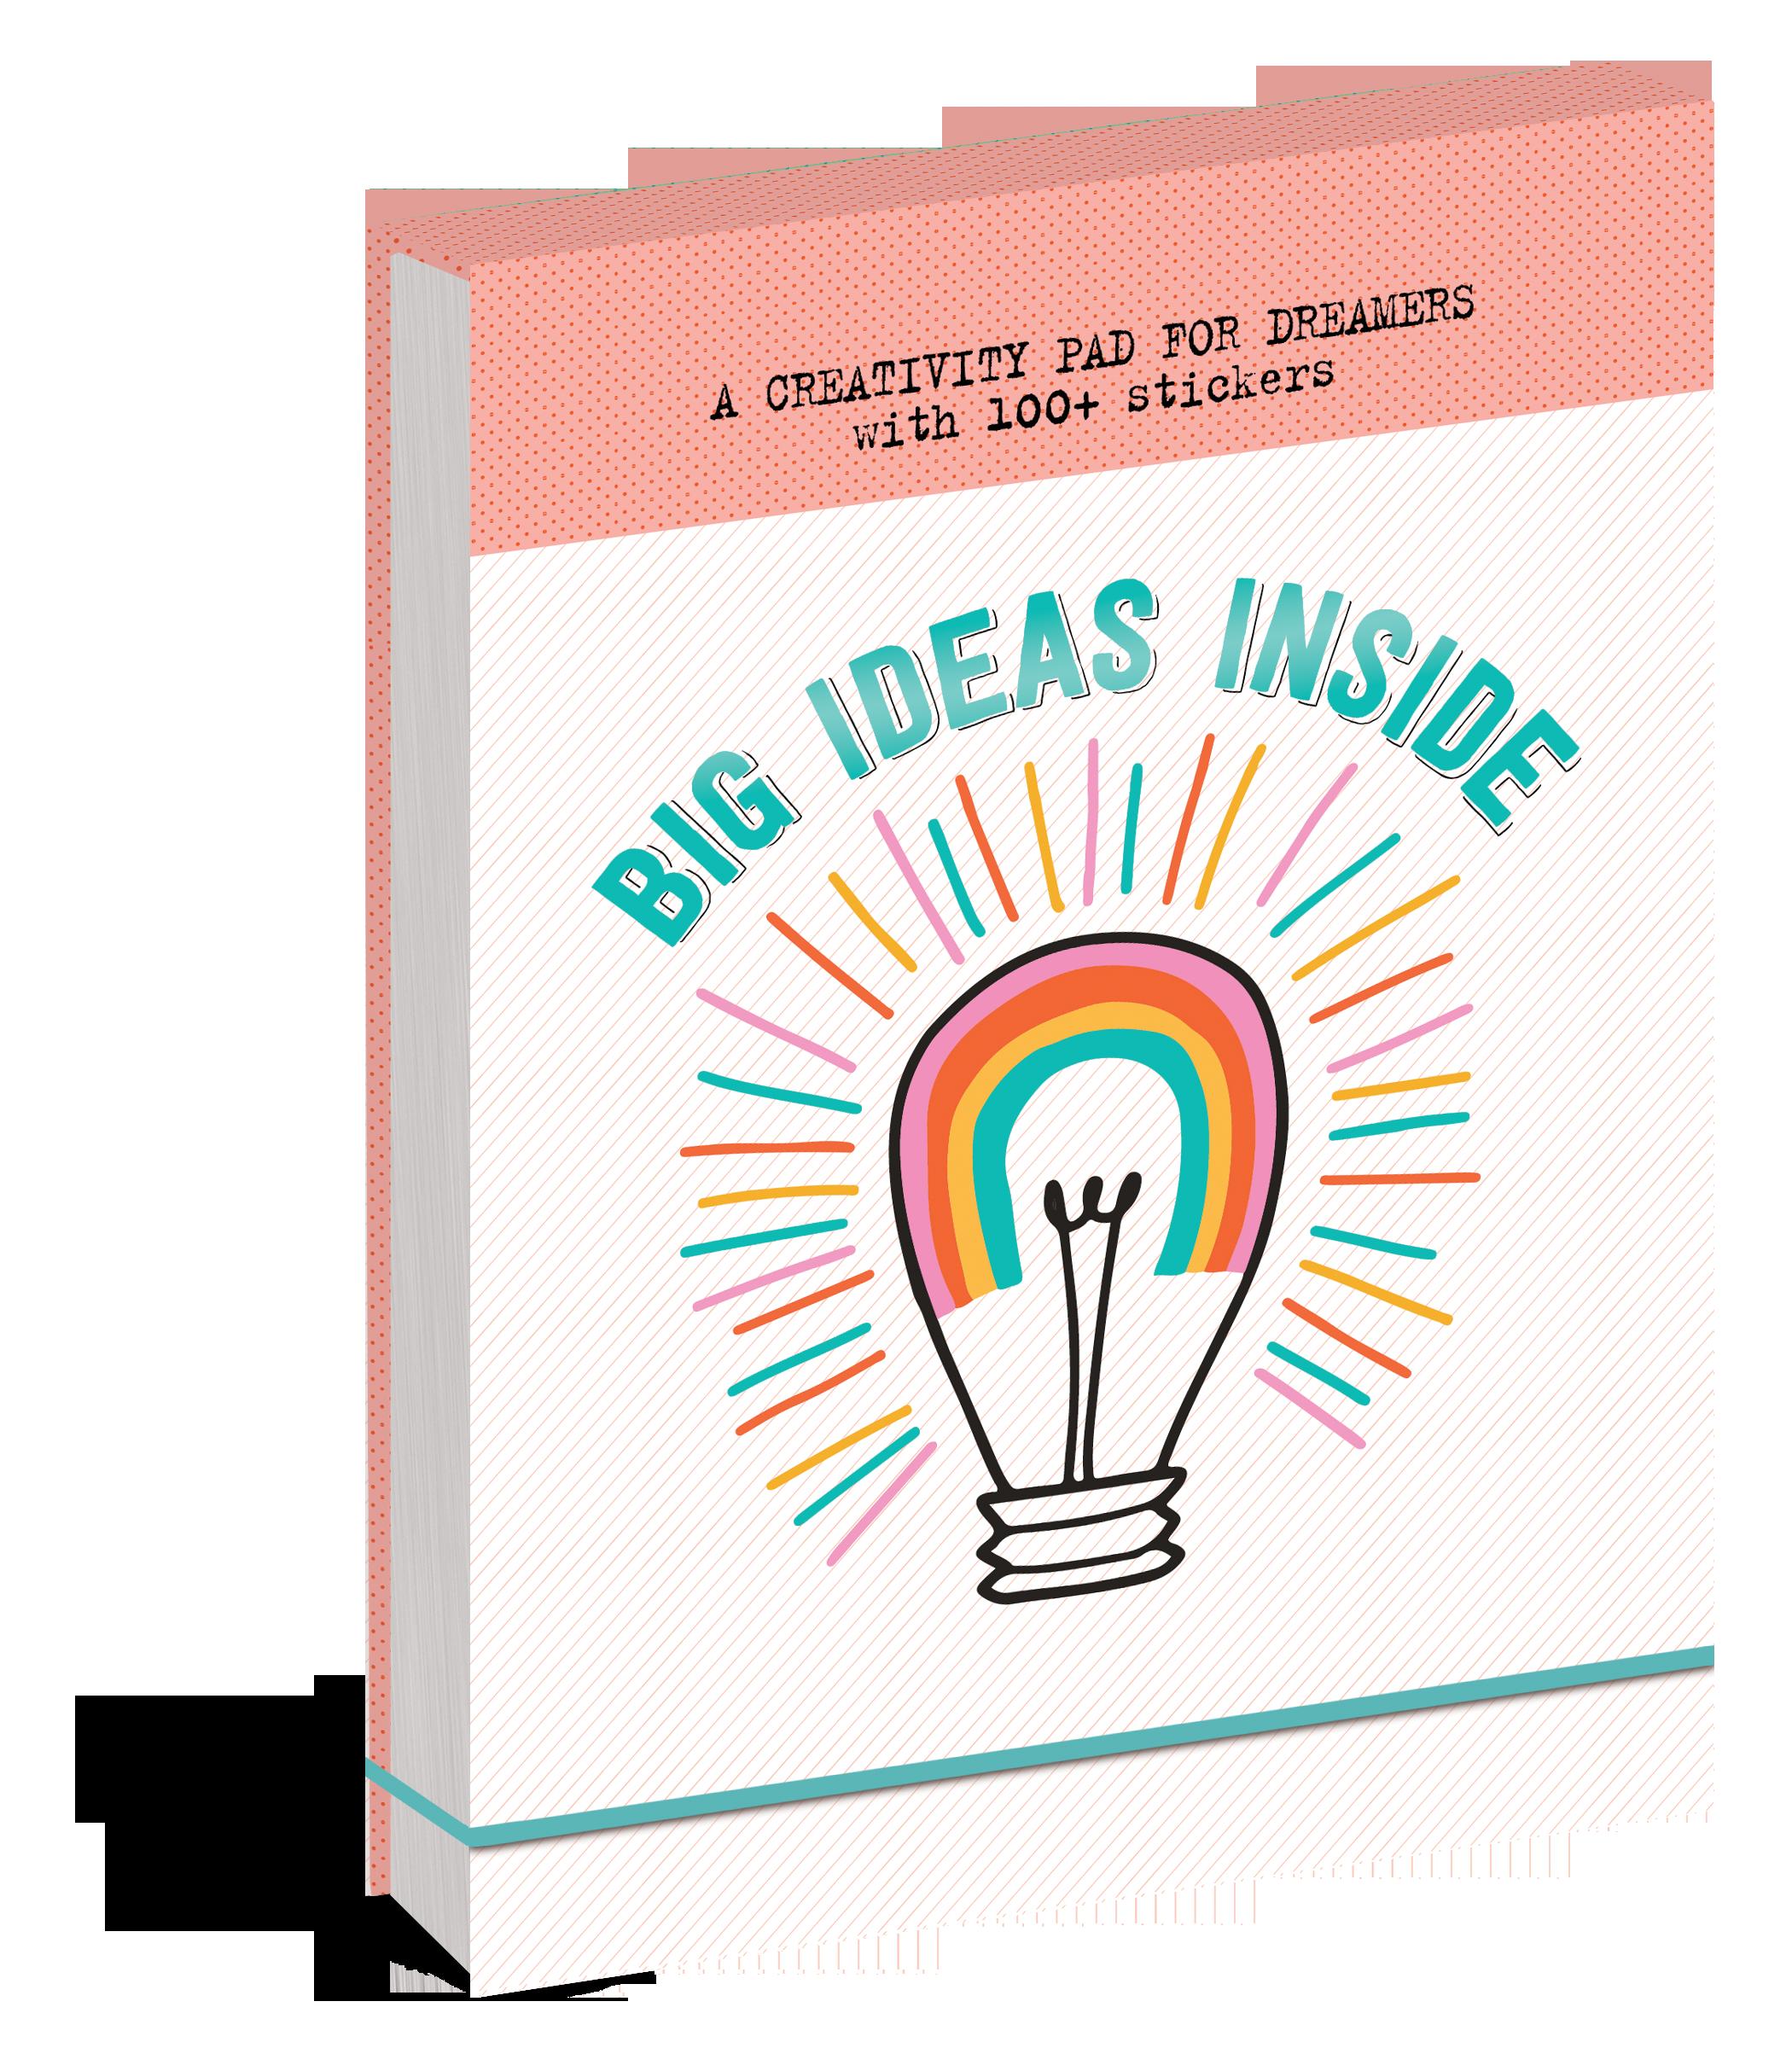 BIG IDEAS INSIDE : A CREATIVITY PAD FOR DREAMERS